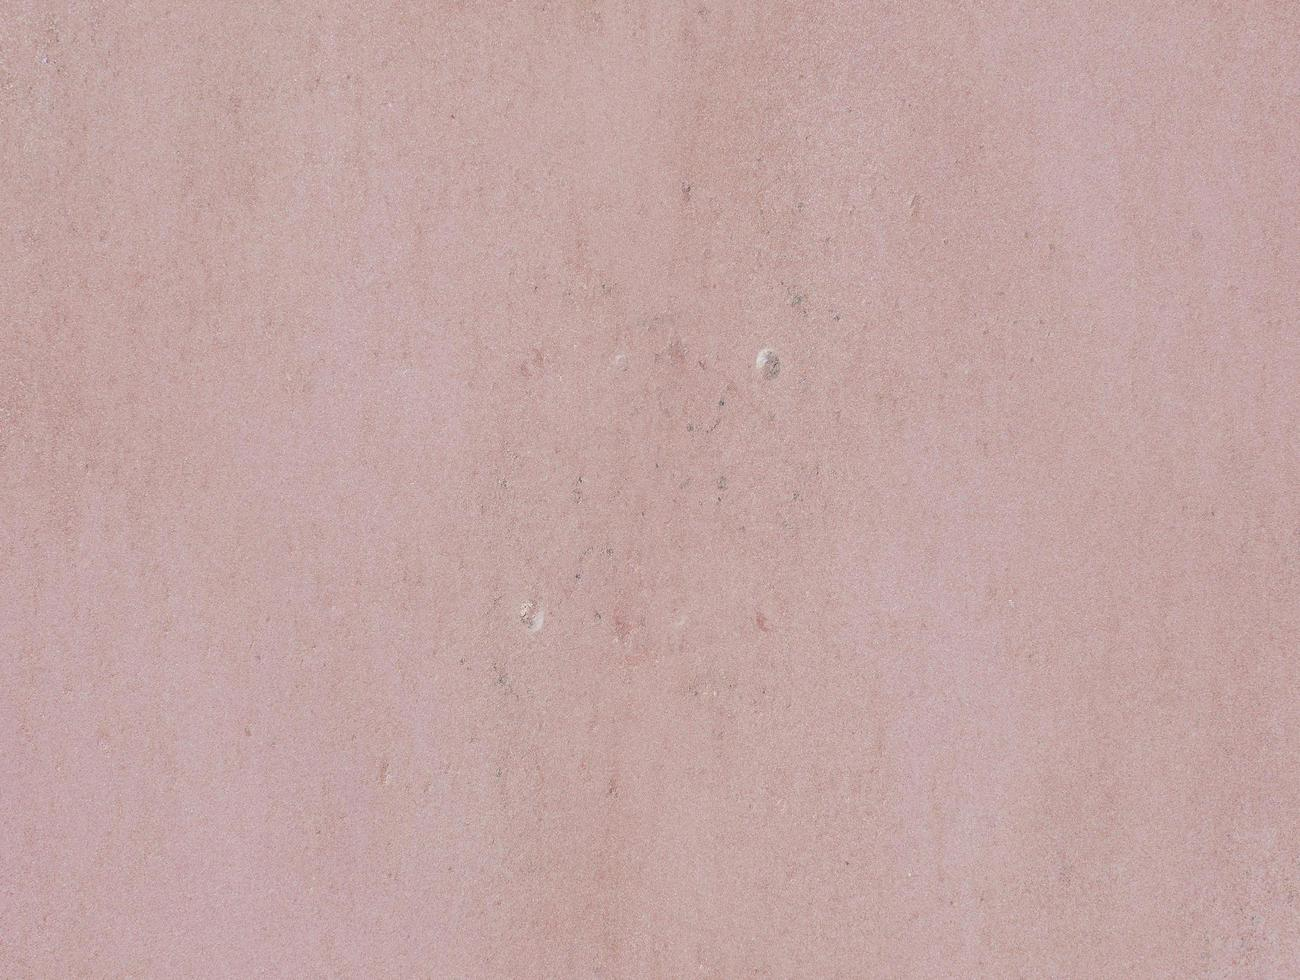 texture de mur rose photo